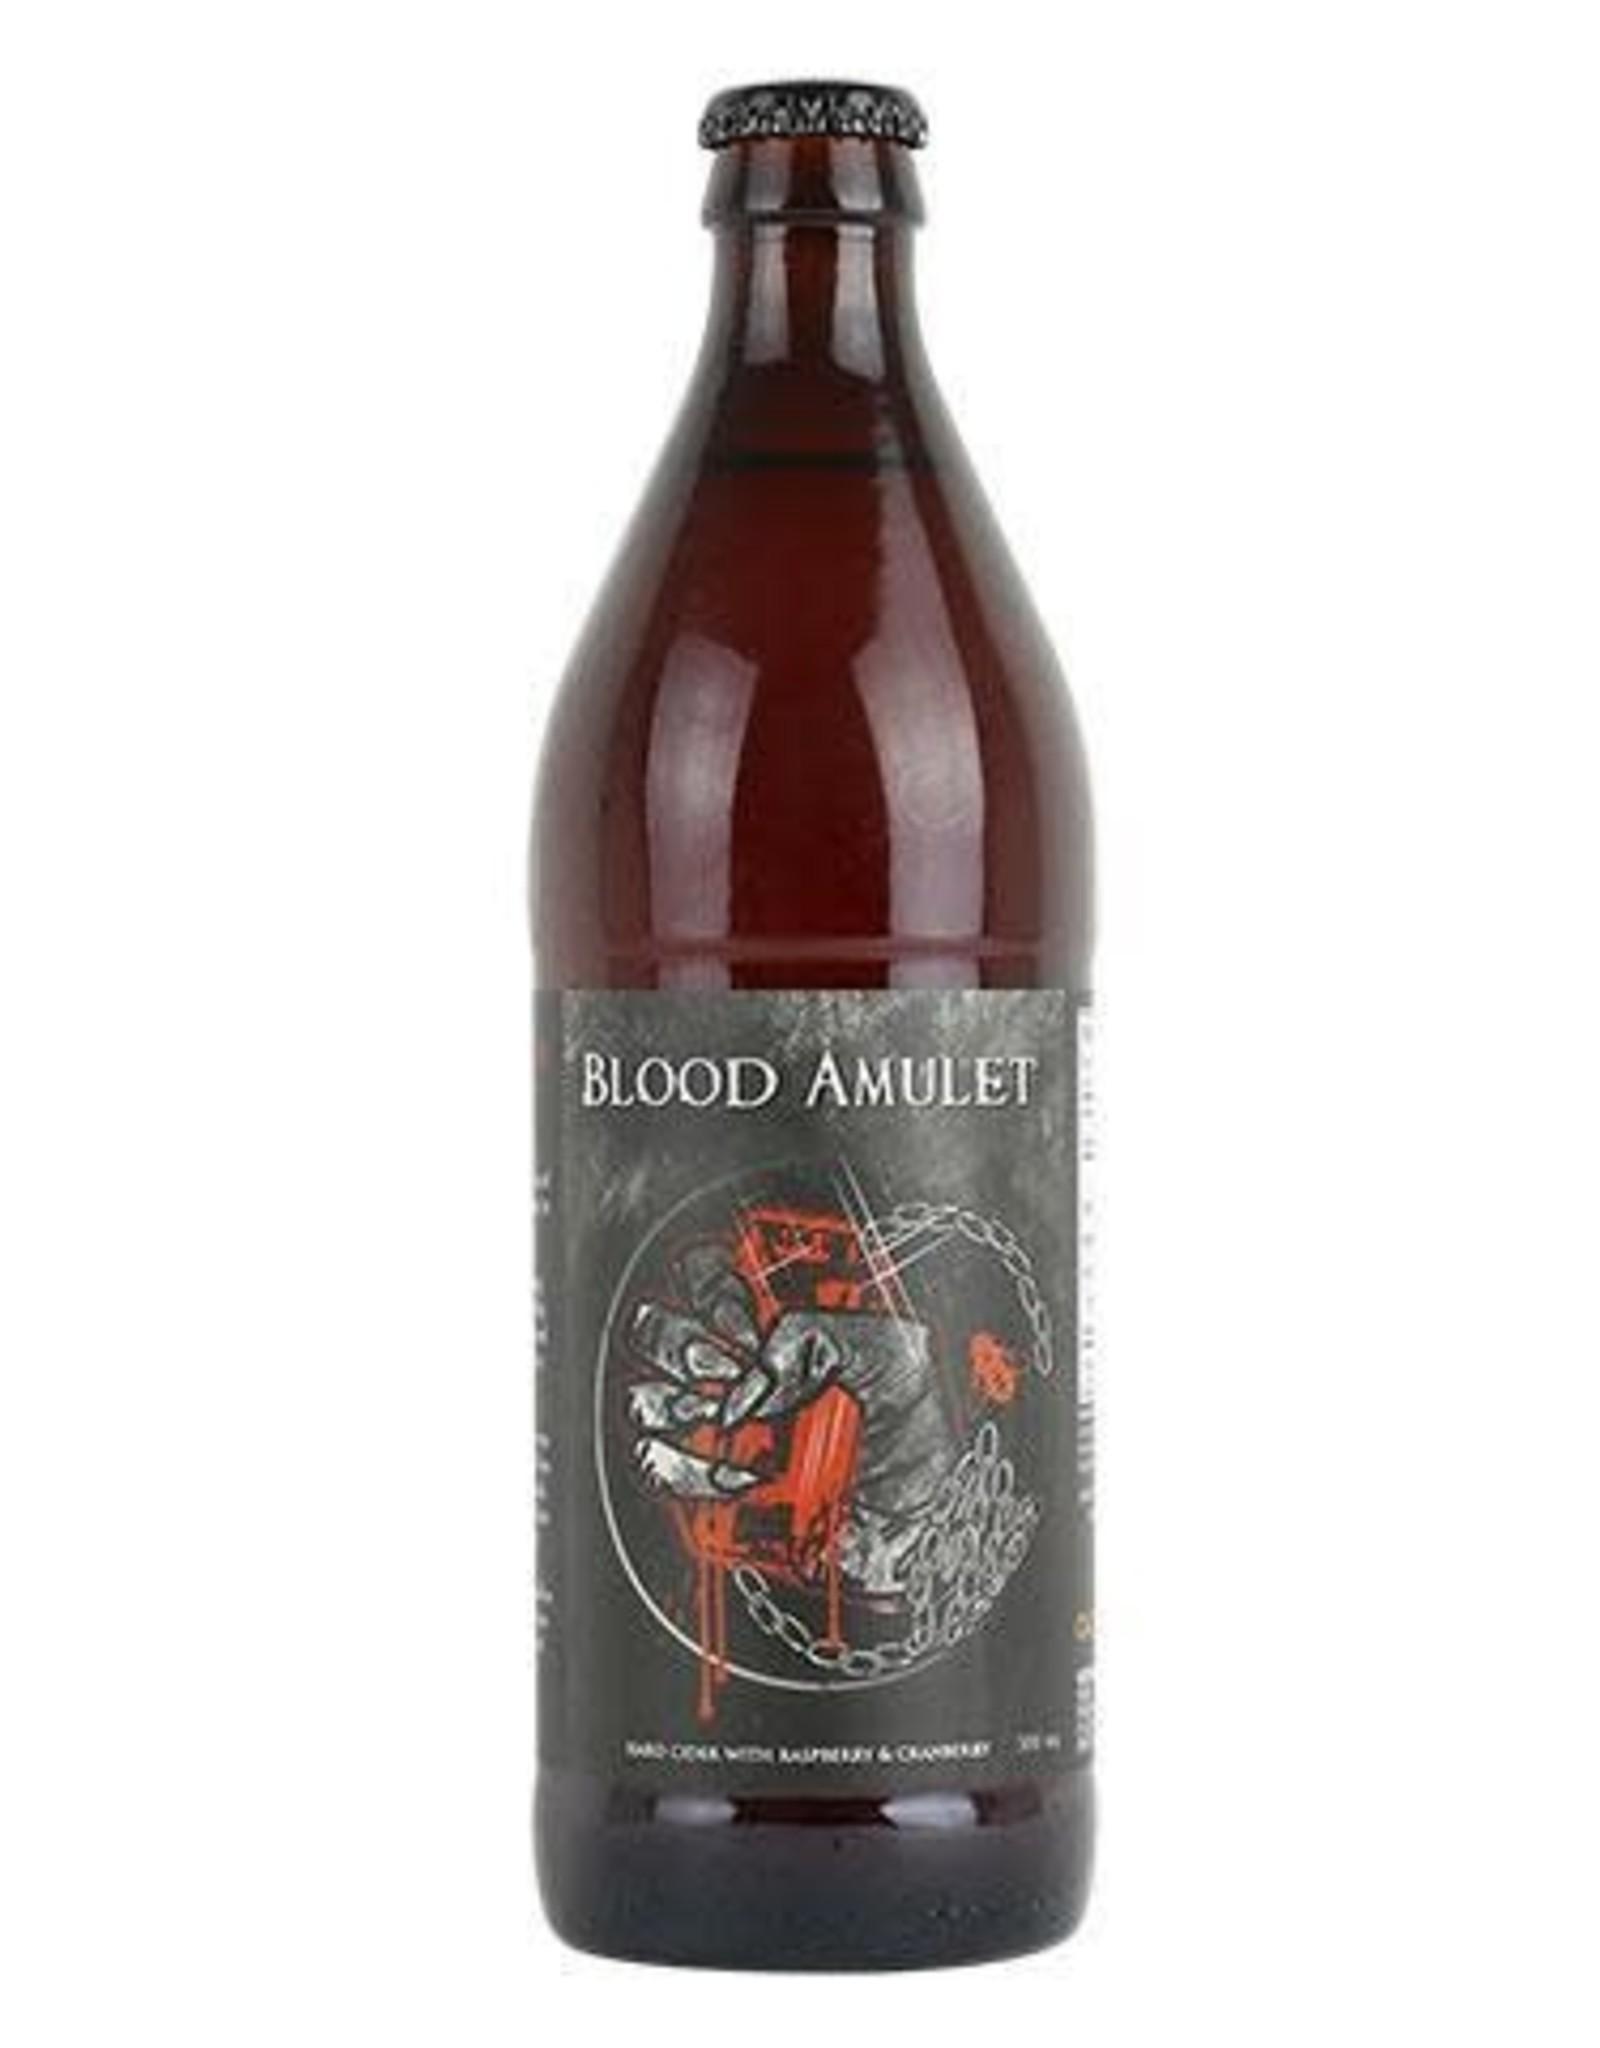 B. Nektar Meadery B. Nektar - Blood Amulet